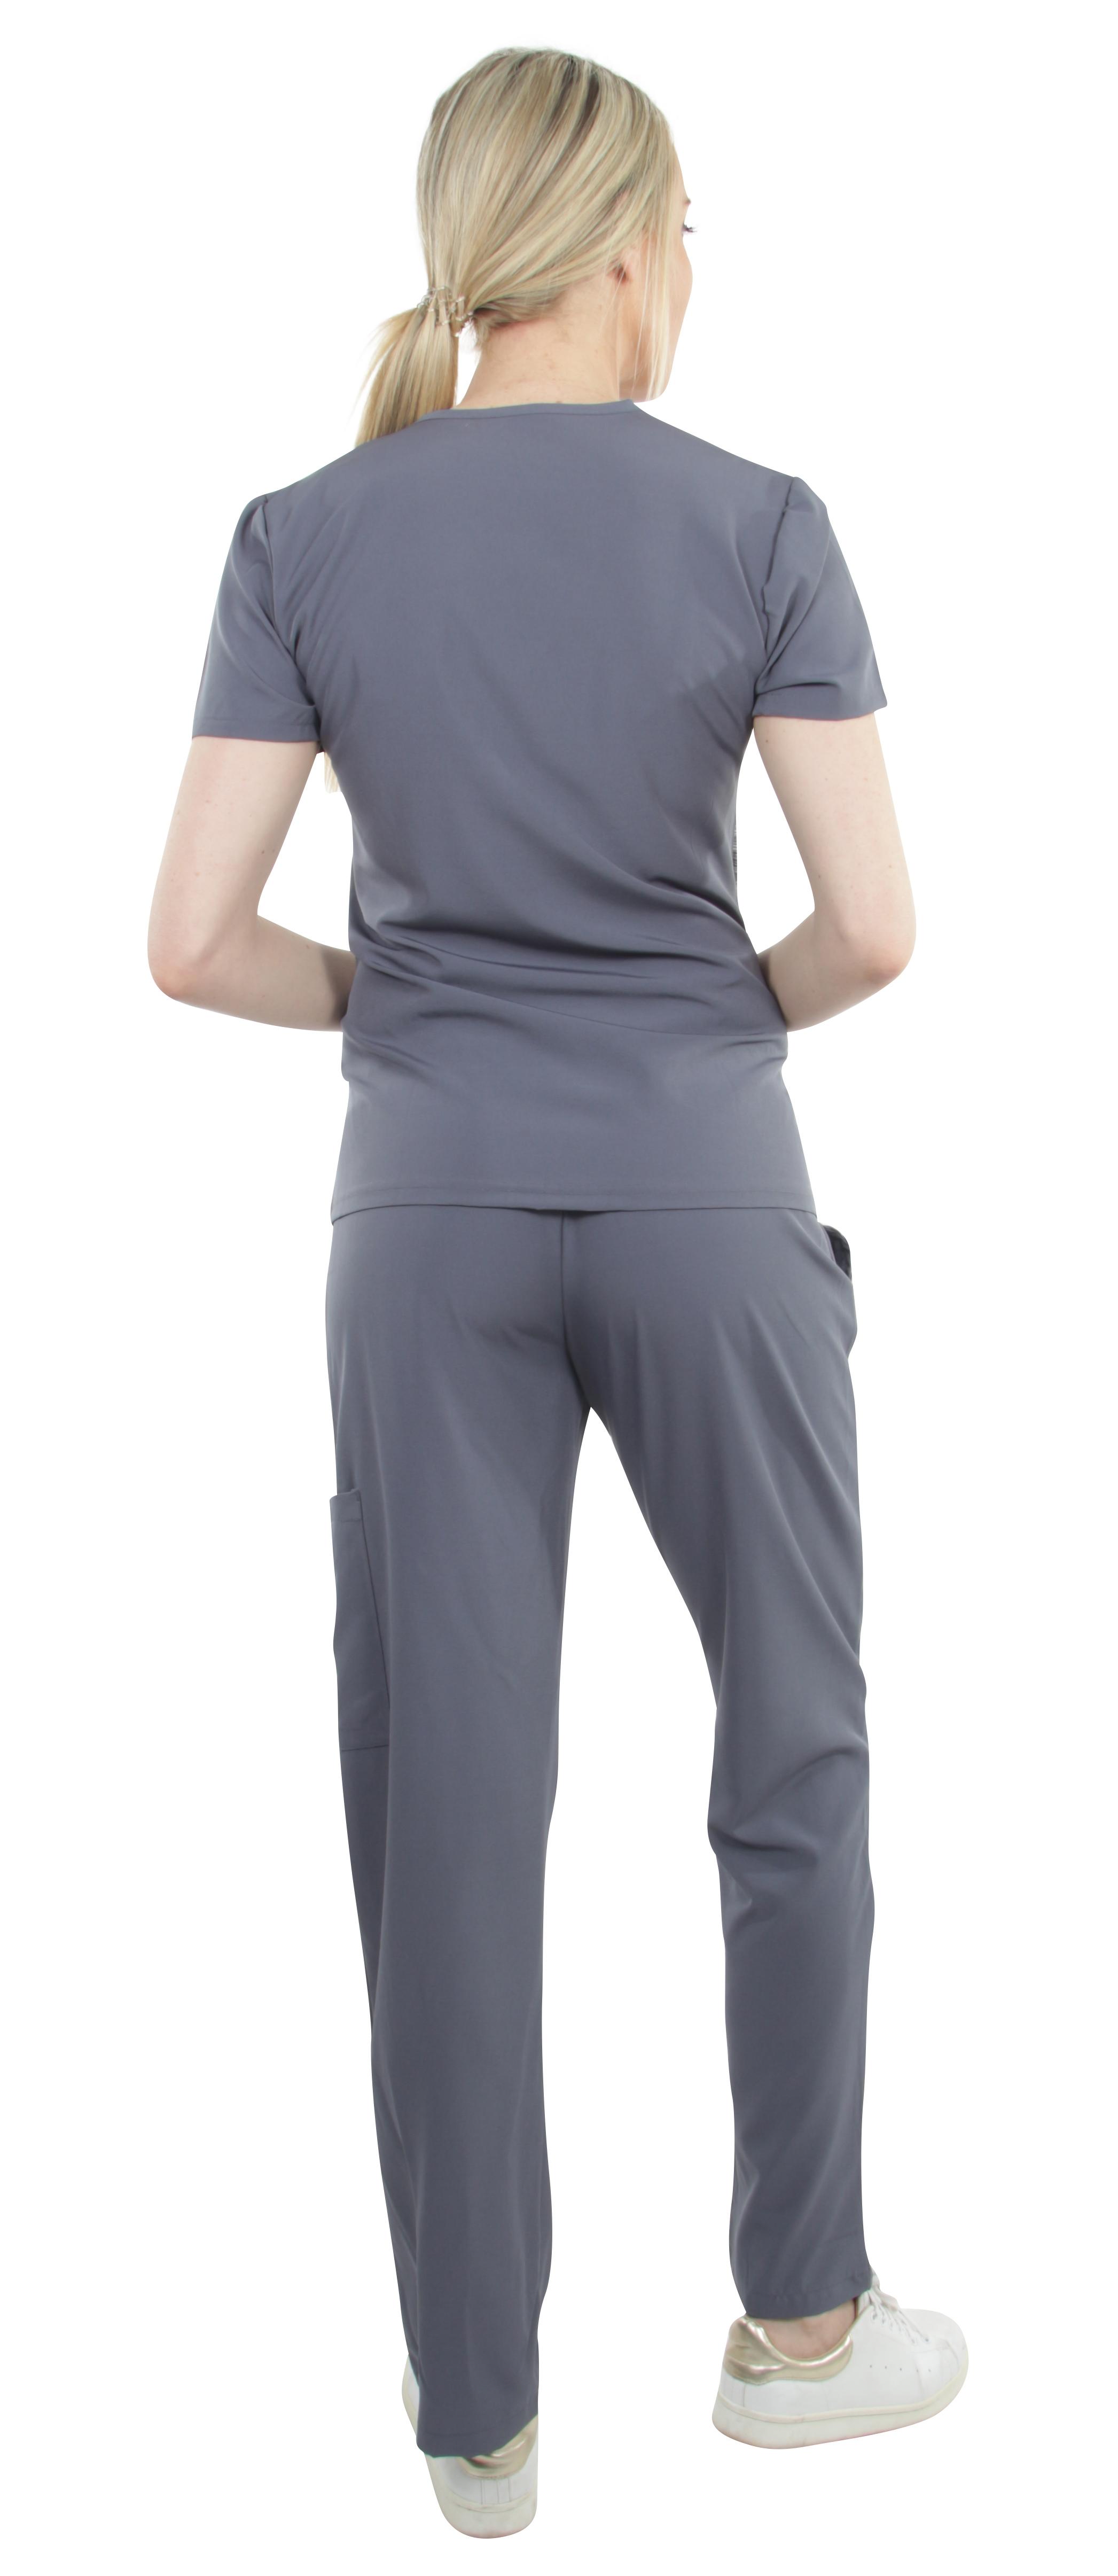 Unisex-Performance-Stretch-Medical-Uniform-Five-Pockets-V-Neck-Scrubs-Sets miniature 27